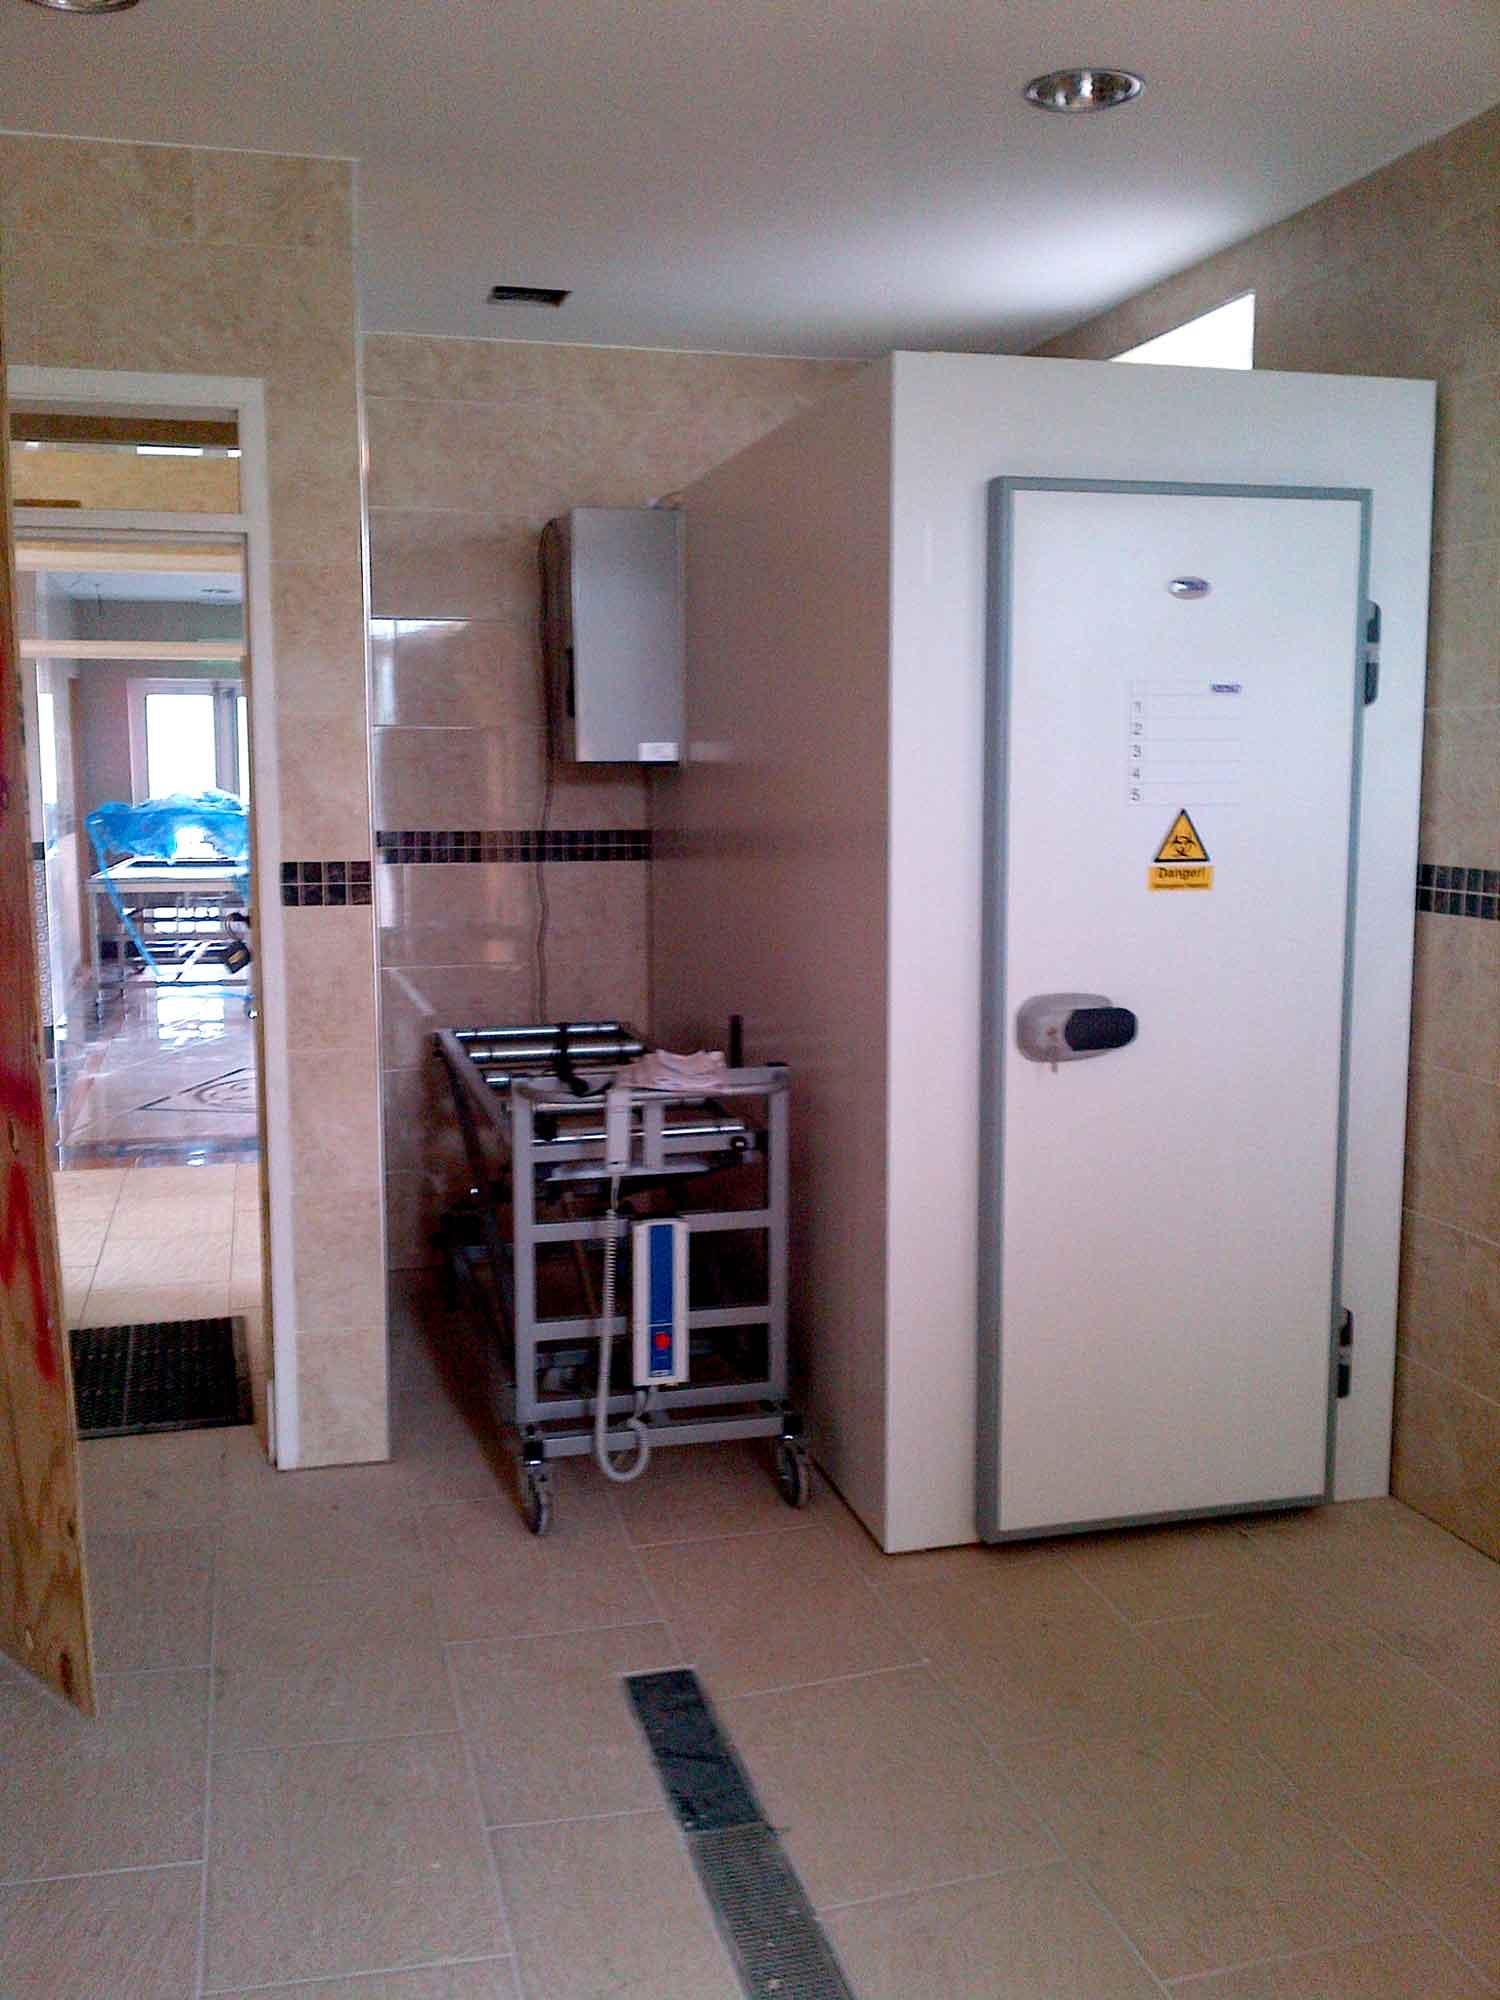 Oldham Mosque Ghusl equipment body chamber